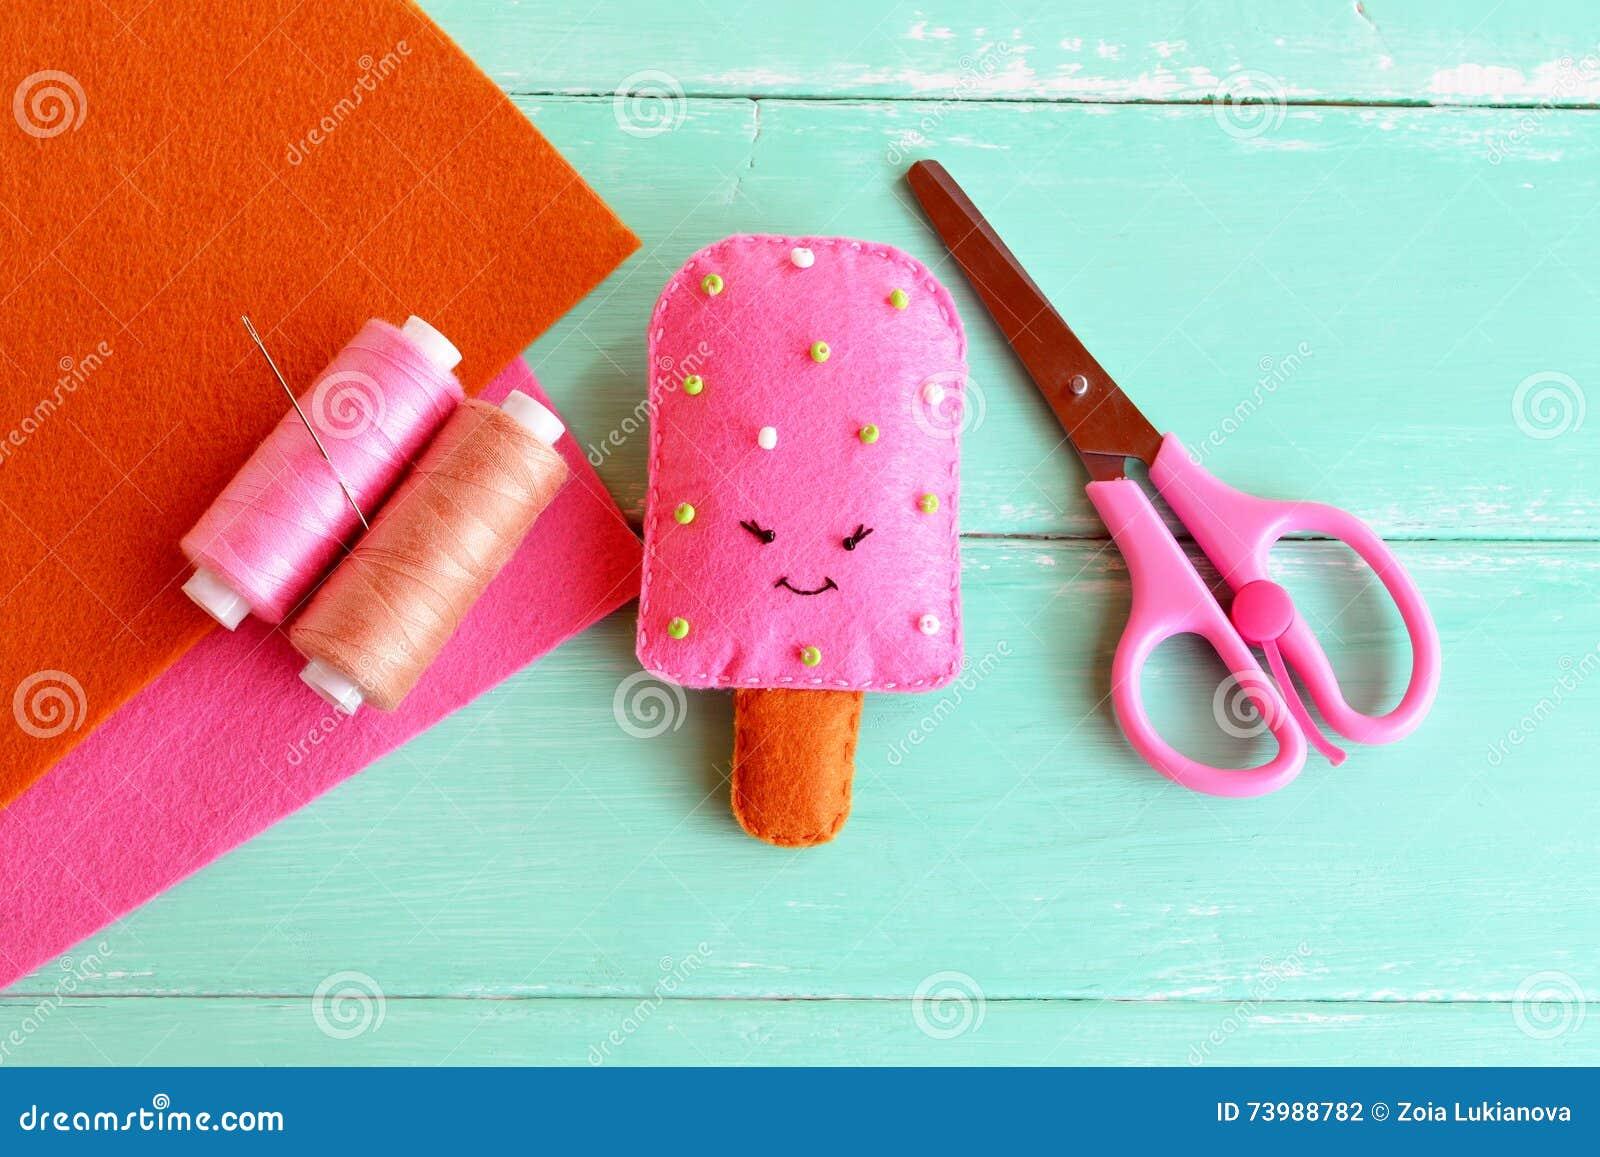 Handmade Felt Ice Felt Food Toy Summer Textile Craft Project